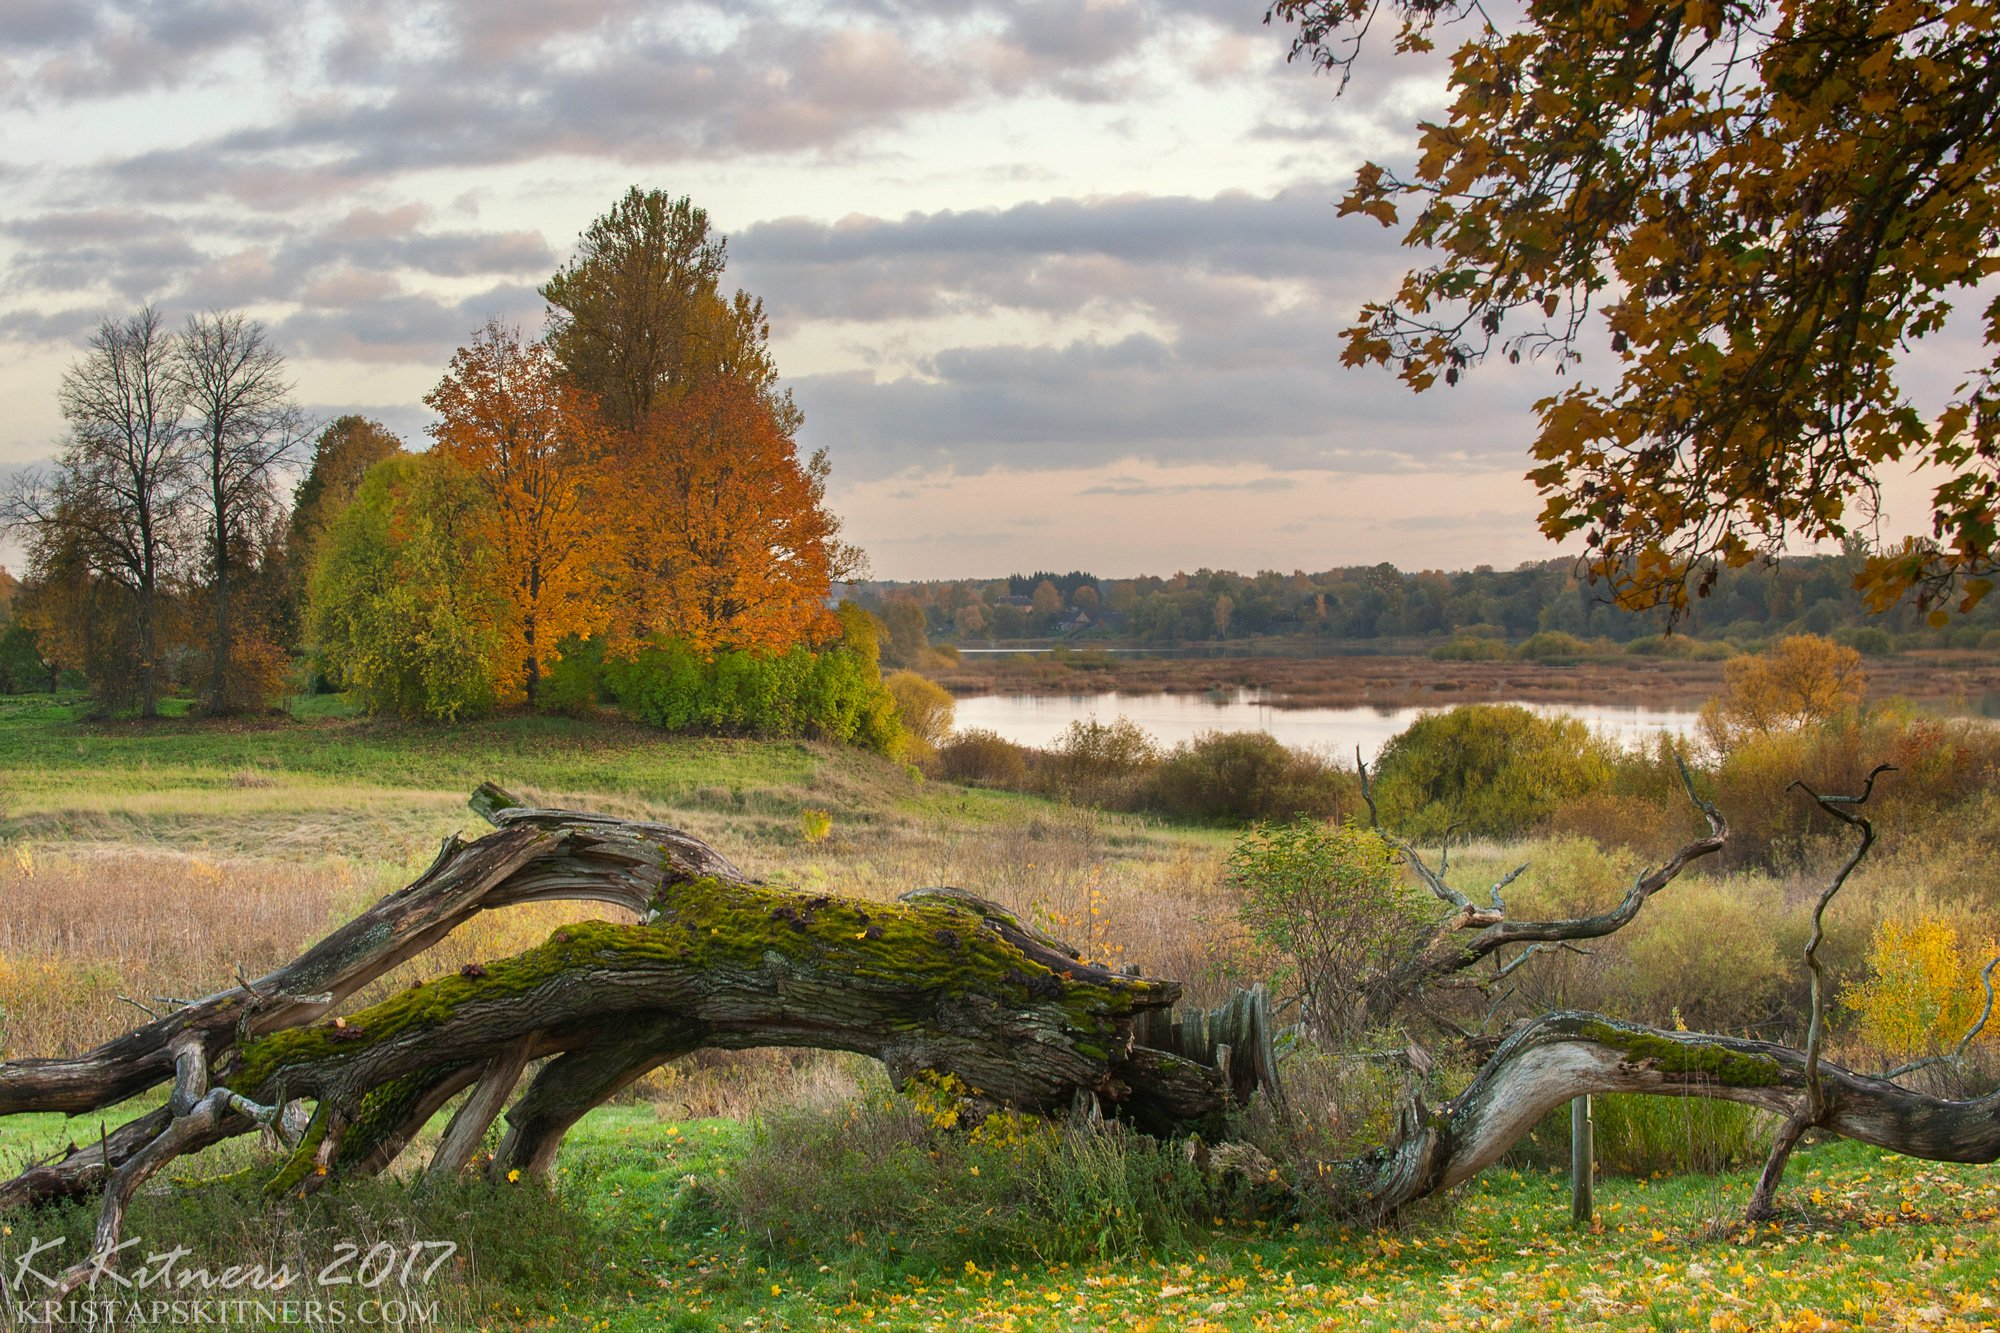 river branch grass field bush autumn tree leaf fevening sky clouds, Kristaps Kitners